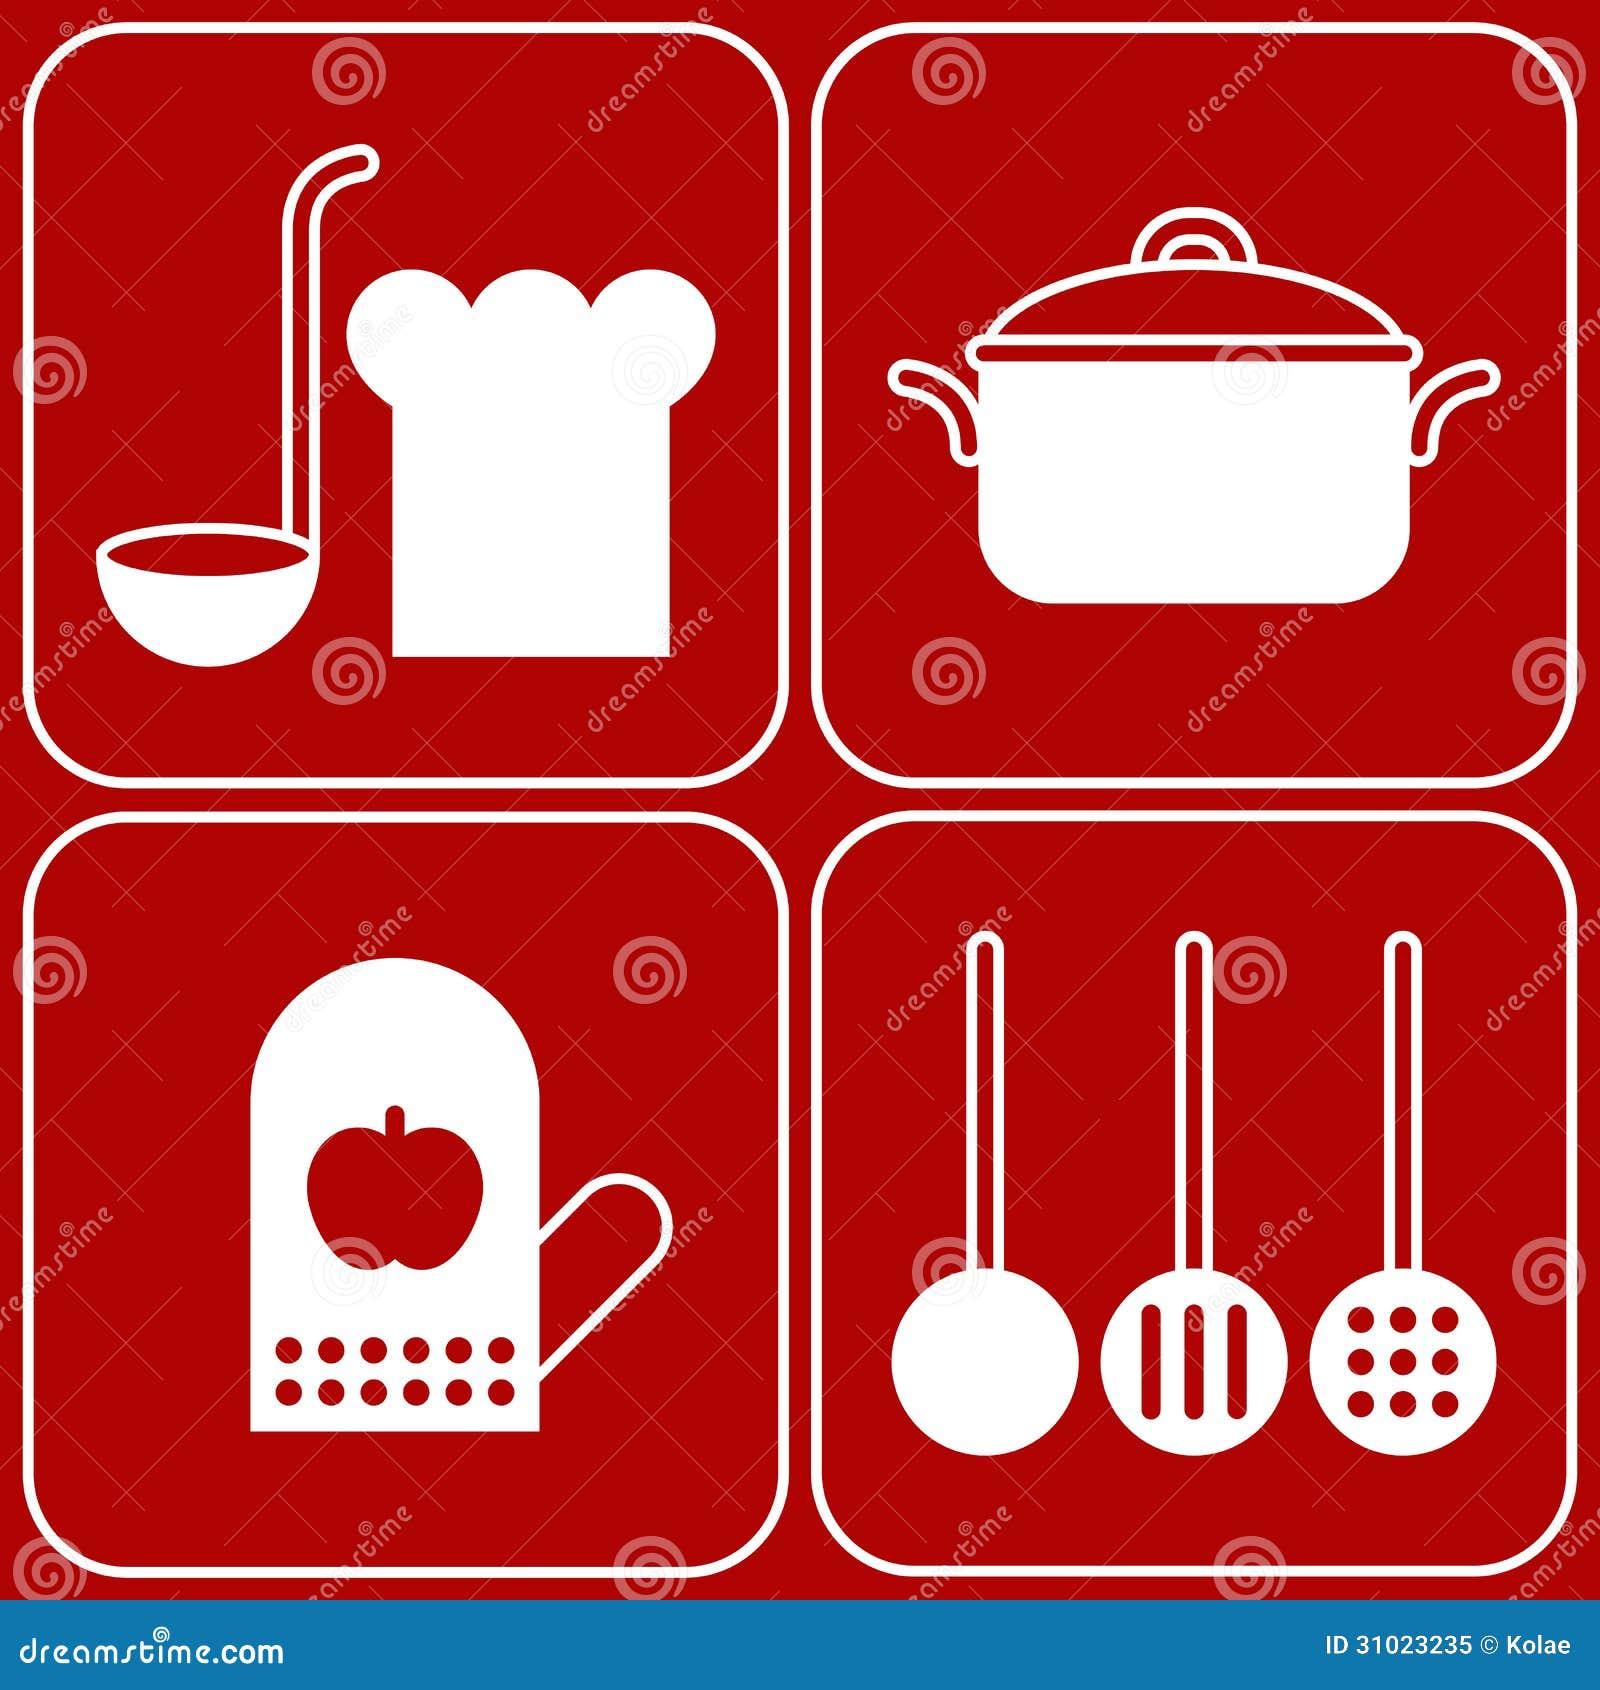 Kitchen Appliances Blogs Kitchen Symbols Royalty Free Stock Photo Image 31023235